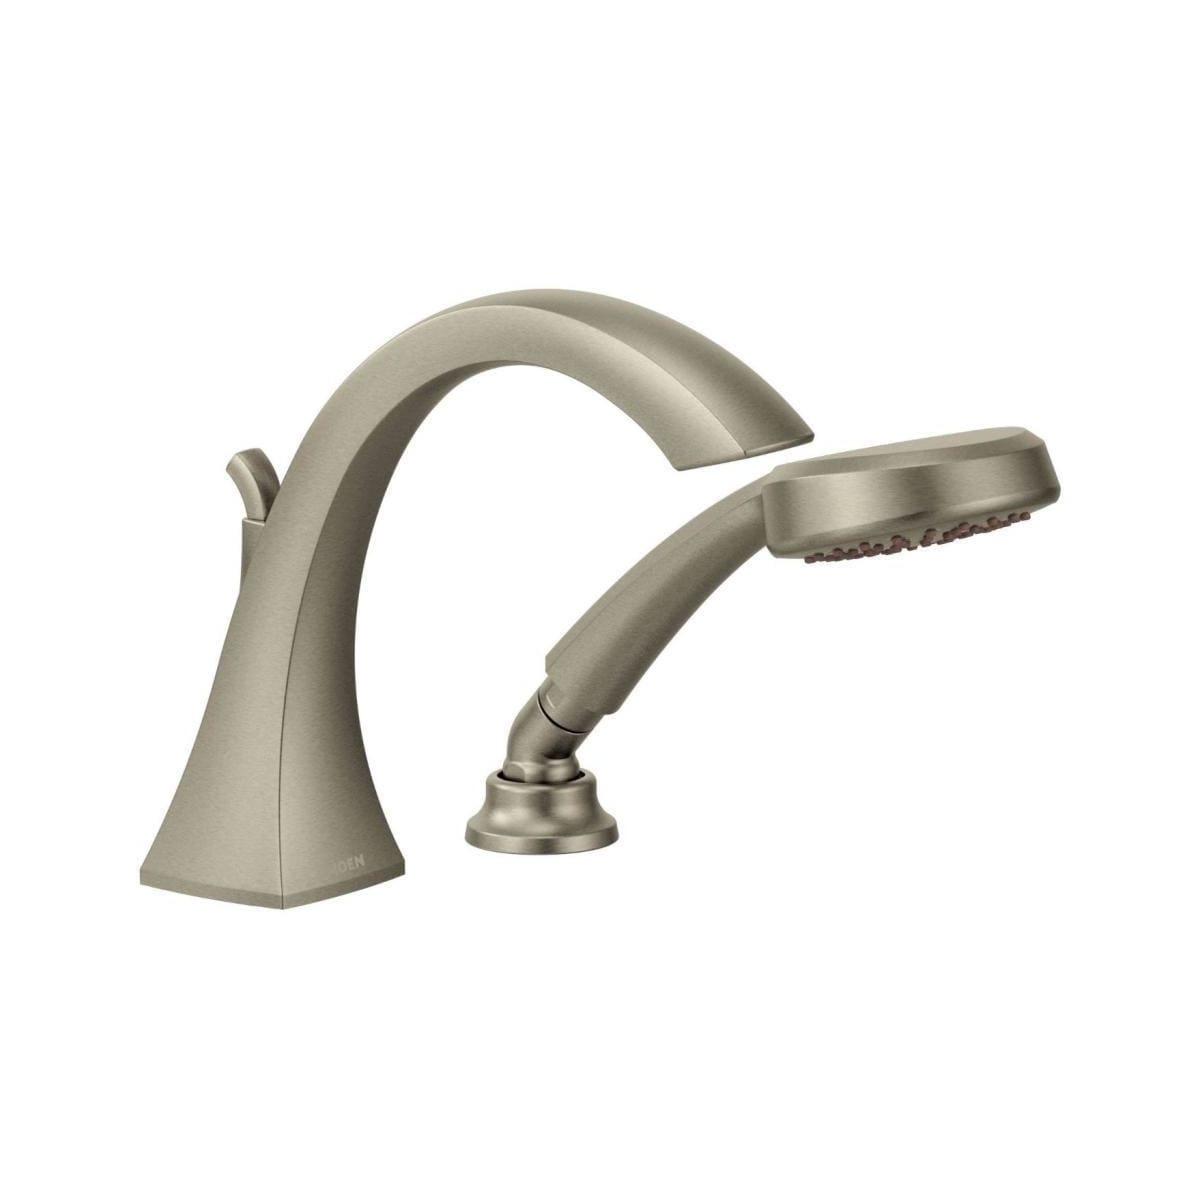 Moen T9694bn Iodigital Set Brushed Nickel Roman Tub Faucet